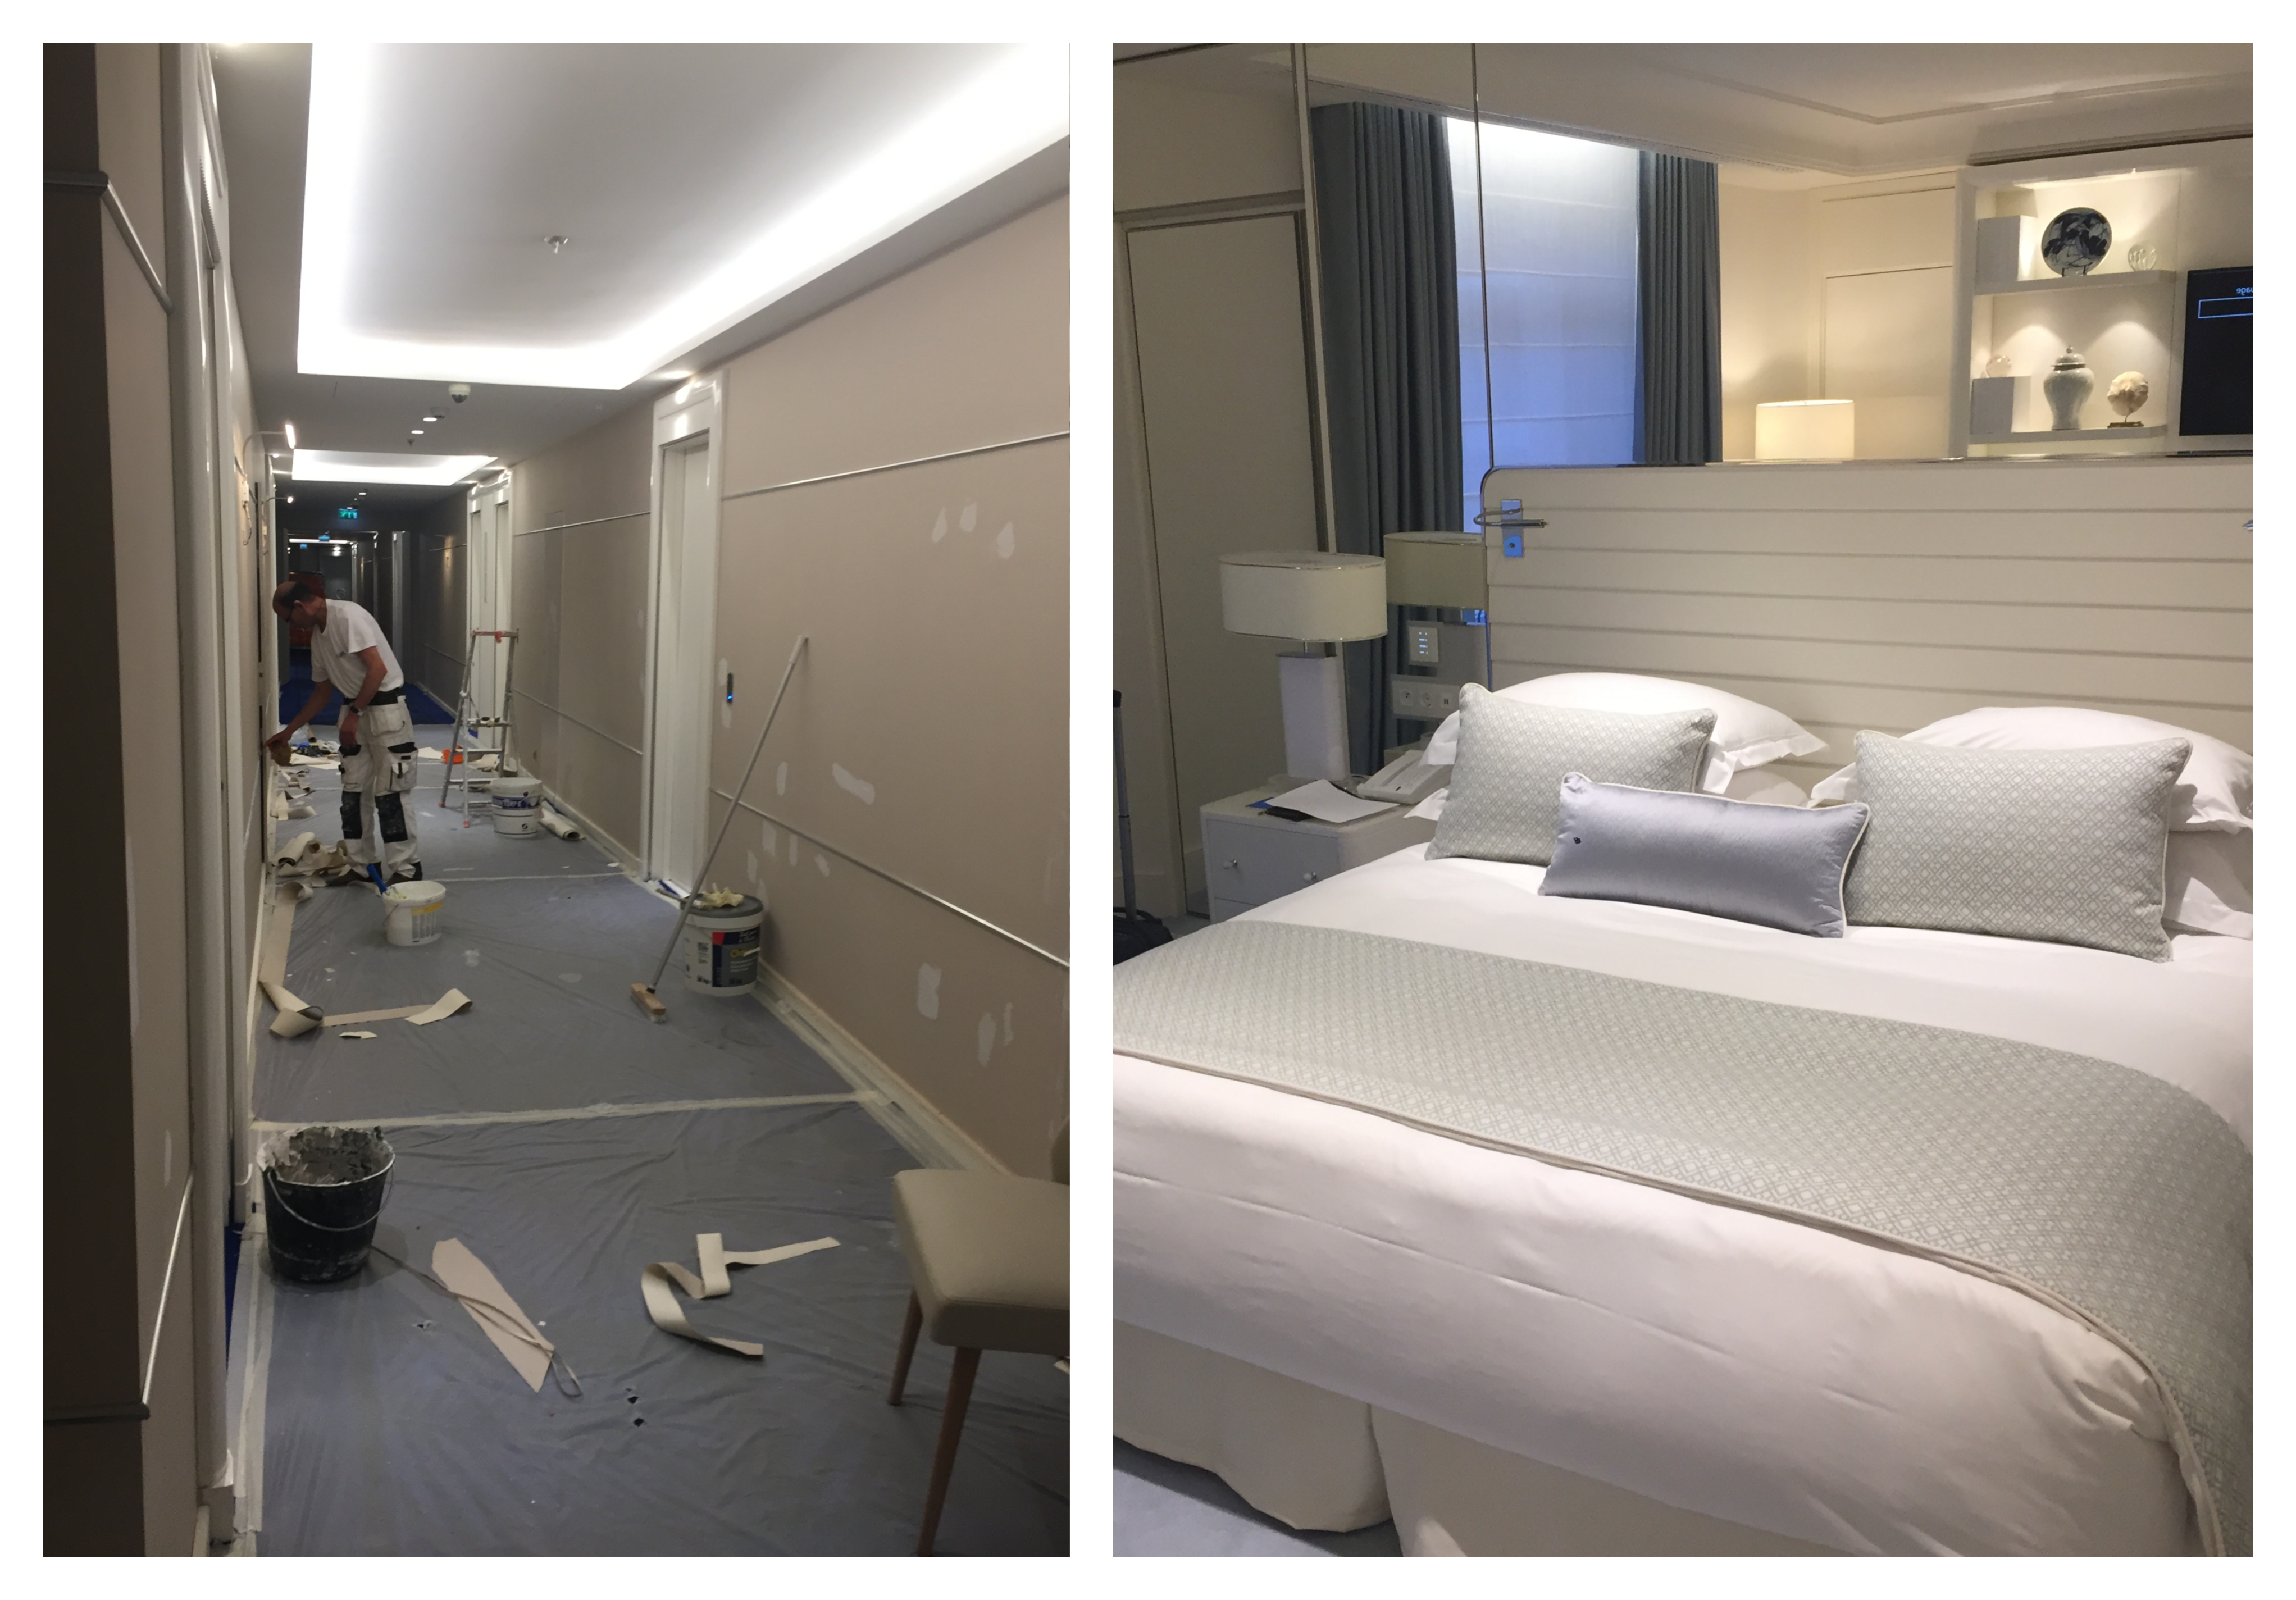 nelly-charter-nellycharter-palaisdebulles-palais-de-bulles-cannes-nice-influencere-blogg-Instagram-presse-markedsføring-melk-&-honning-melkoghonning-hotel-martinez-hotelmartinez